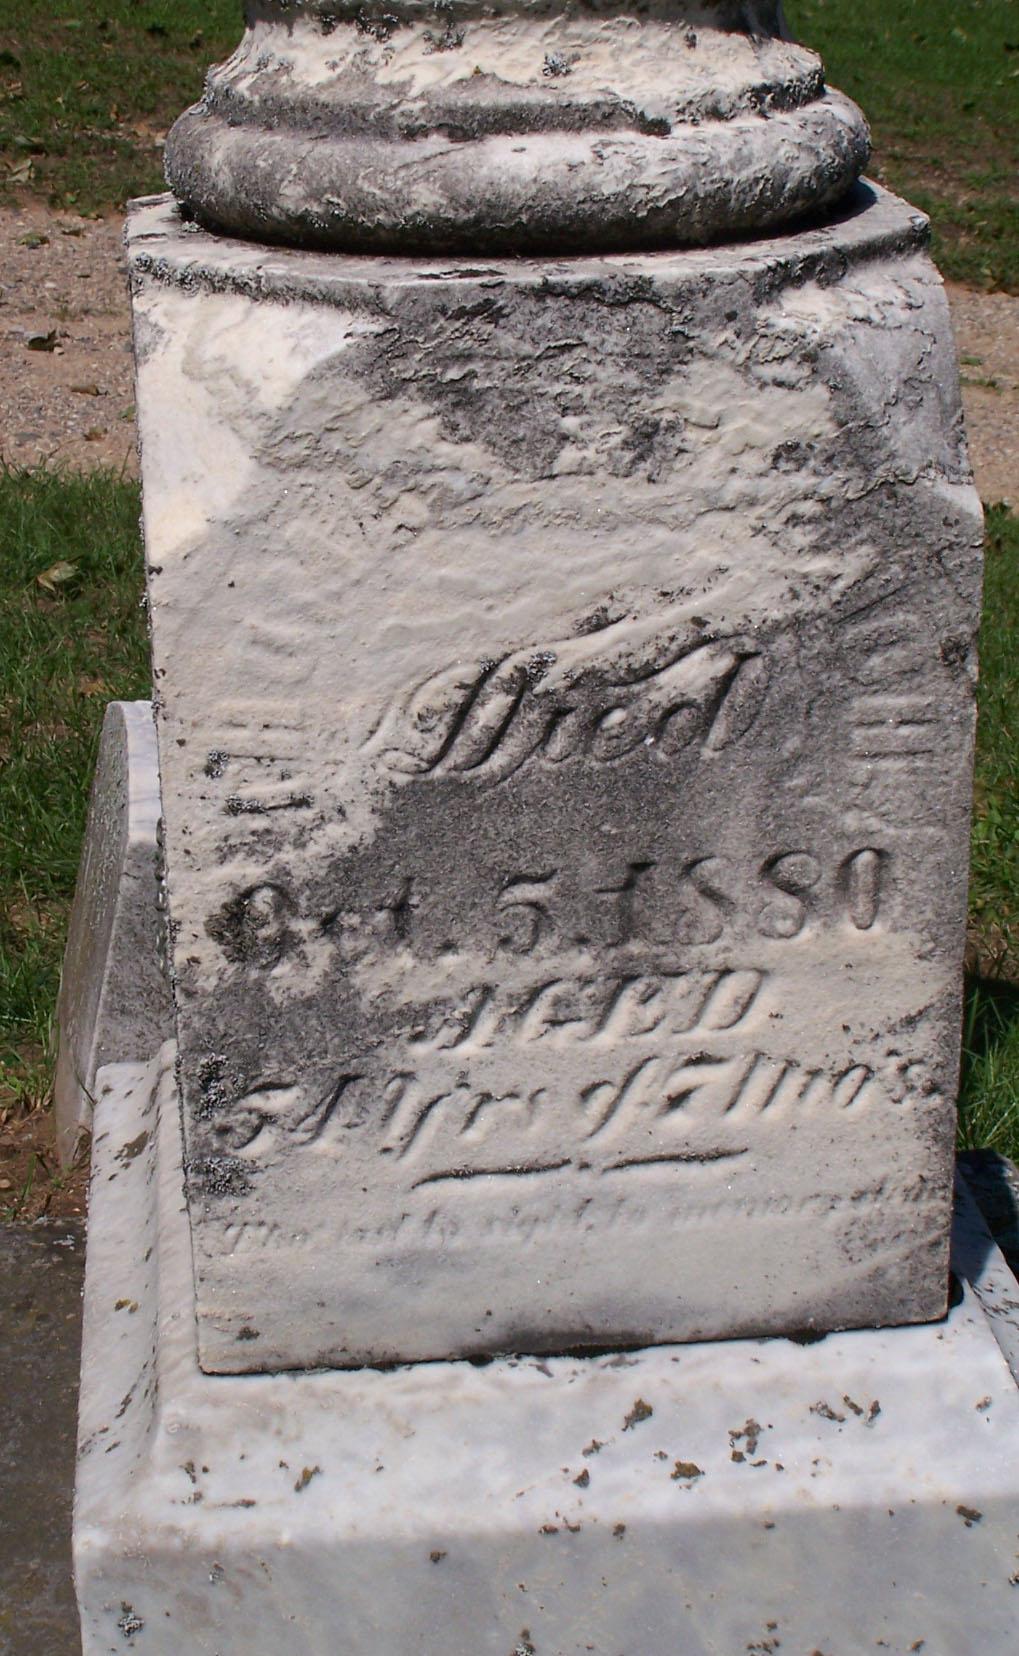 Tho Stone